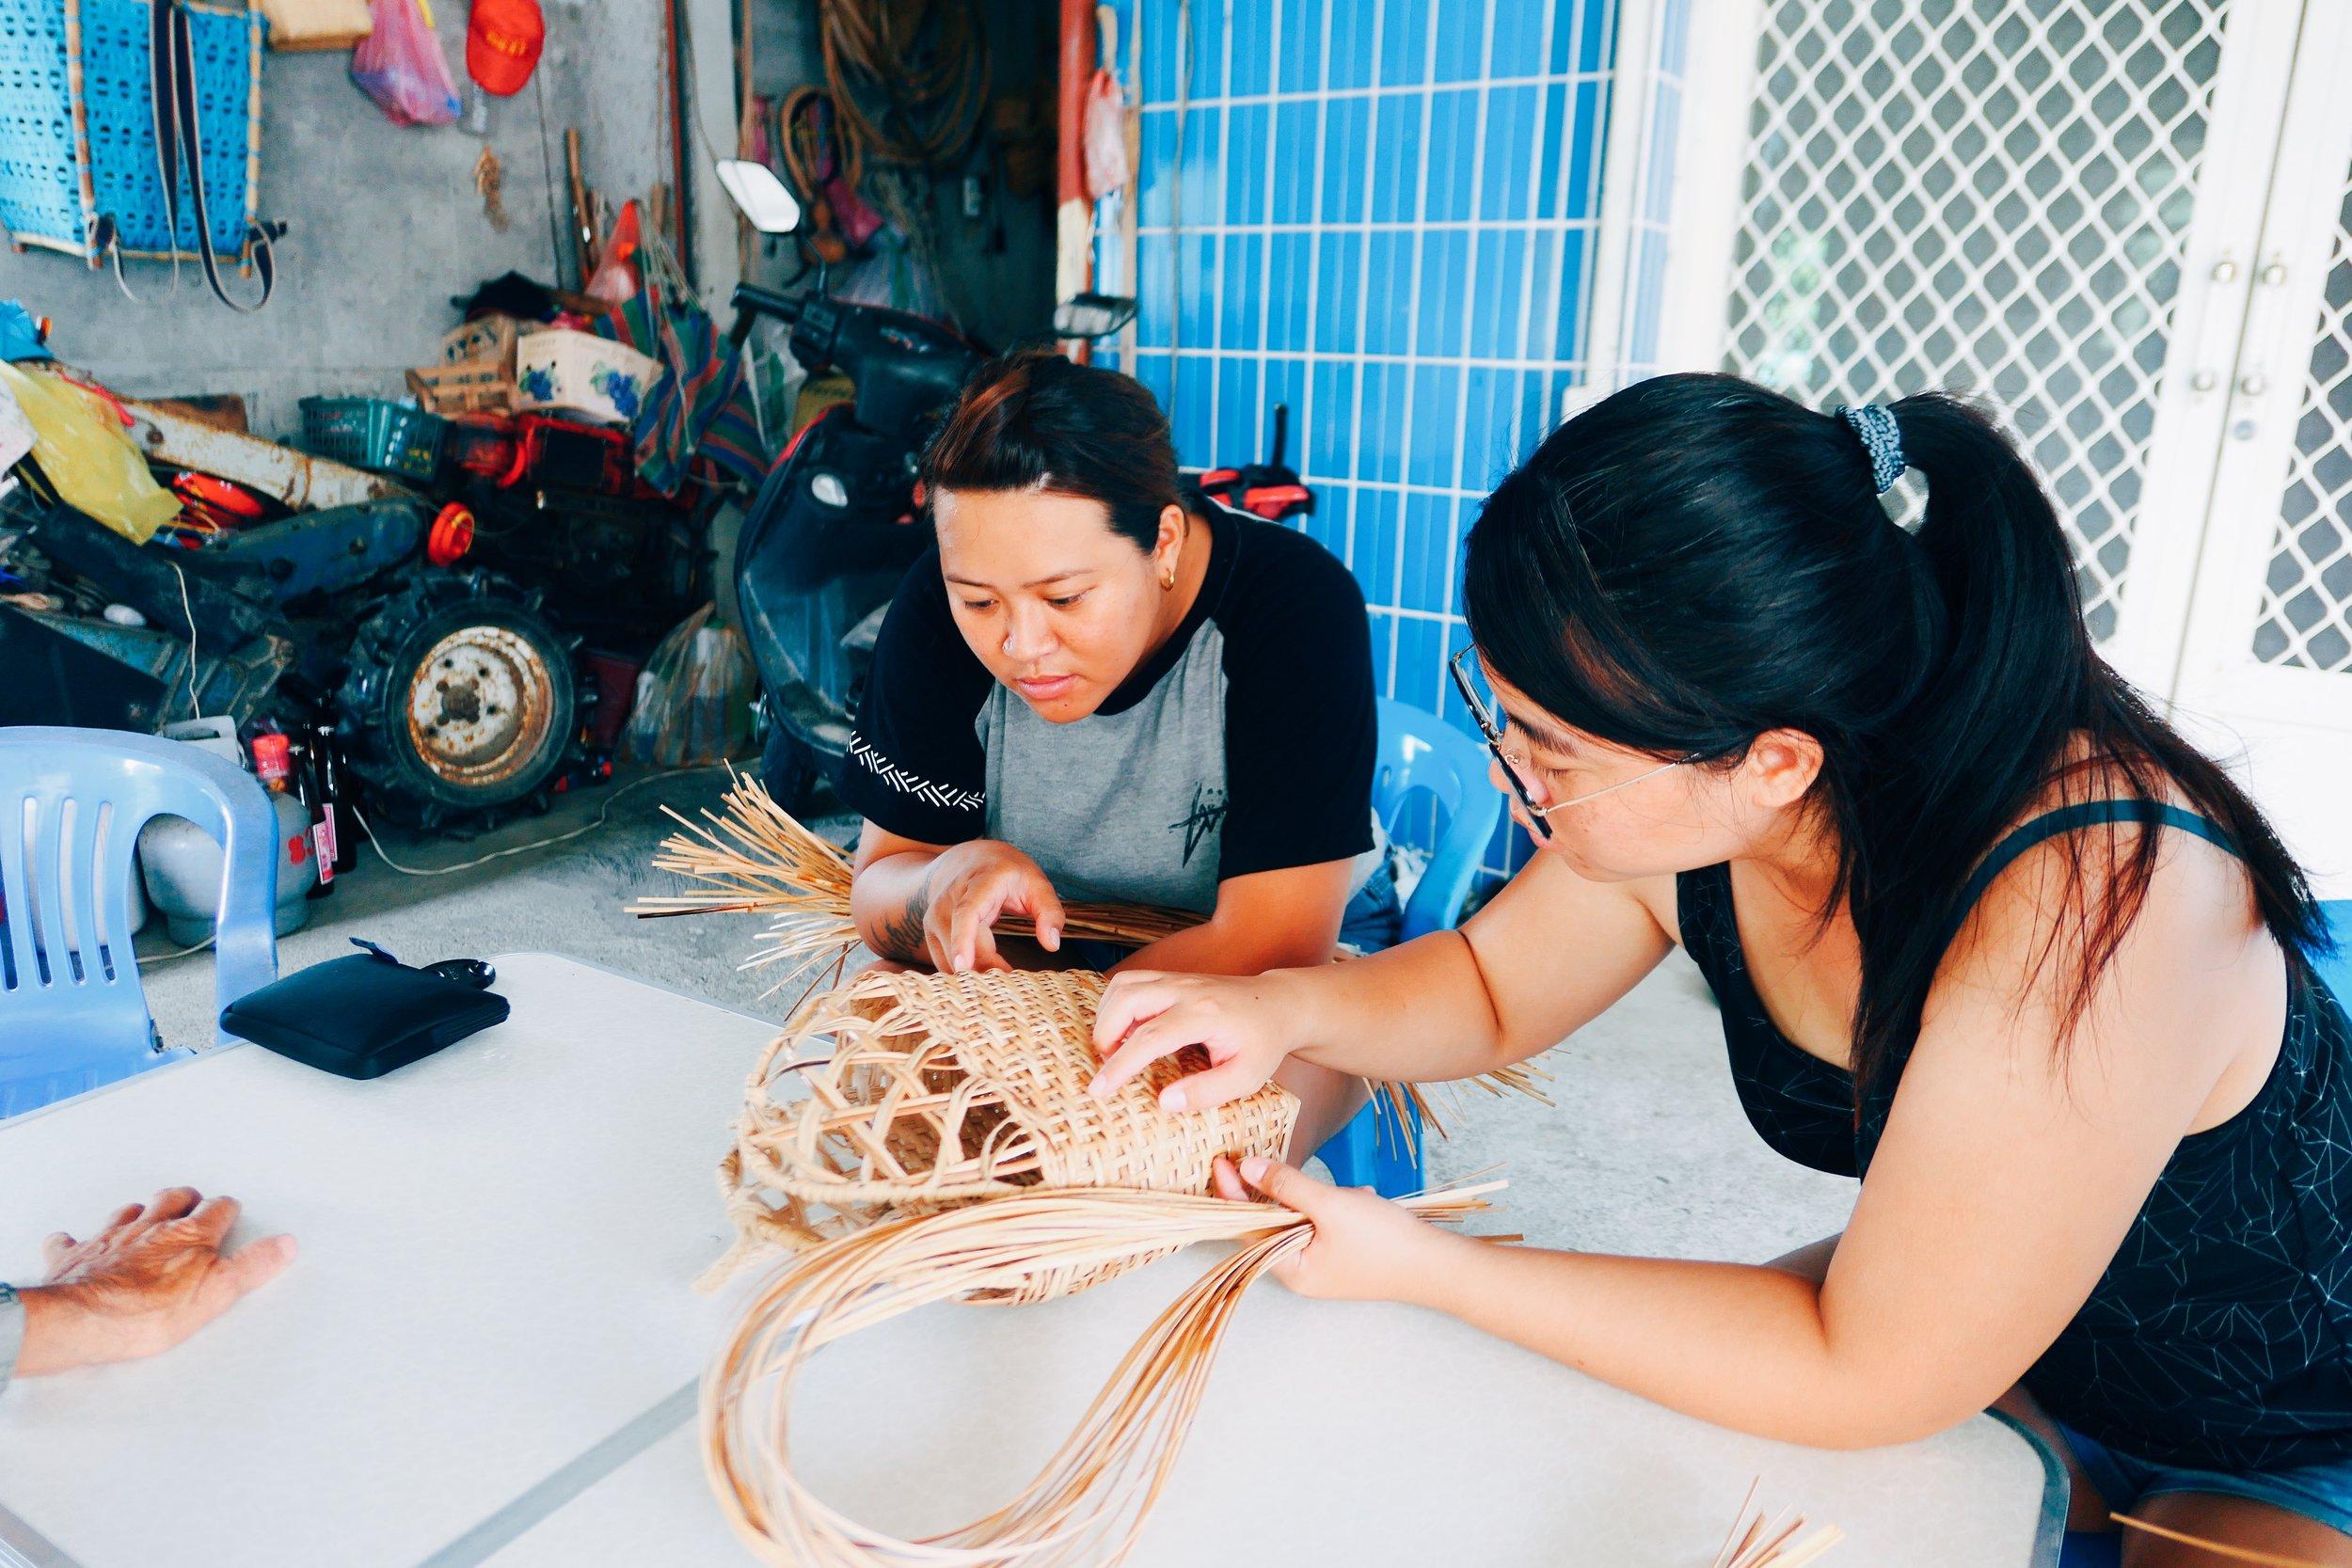 Arik(左)、Tipus(右)細數著製作kaway所需要的籐皮數量